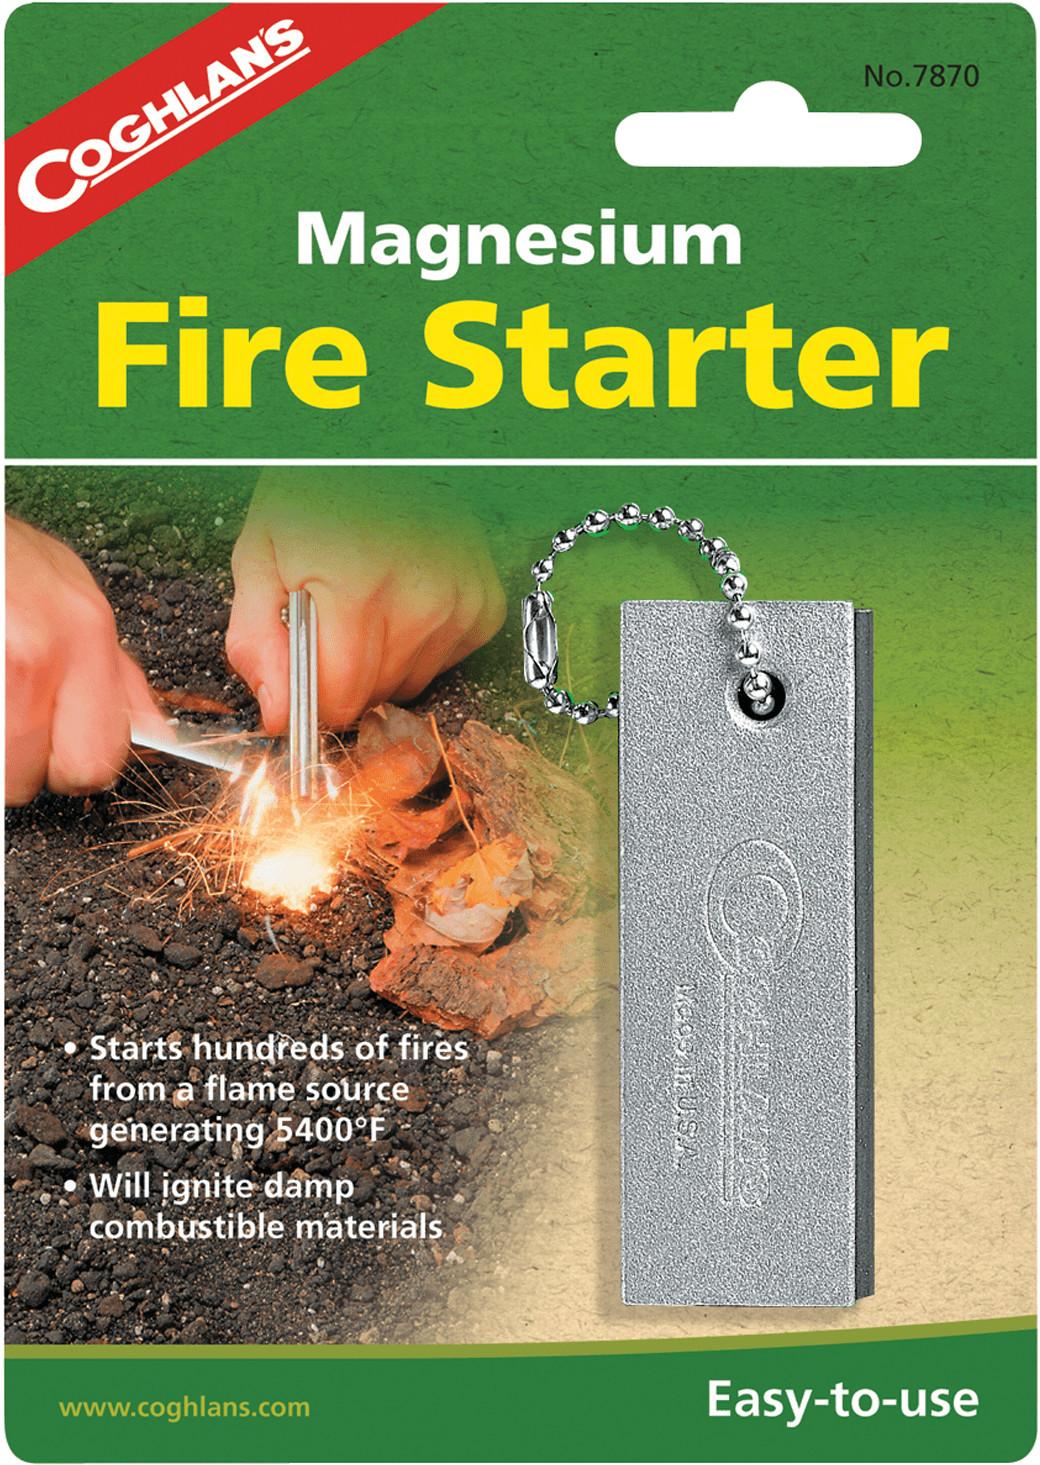 Coghlan´s Magnesium Fire Starter